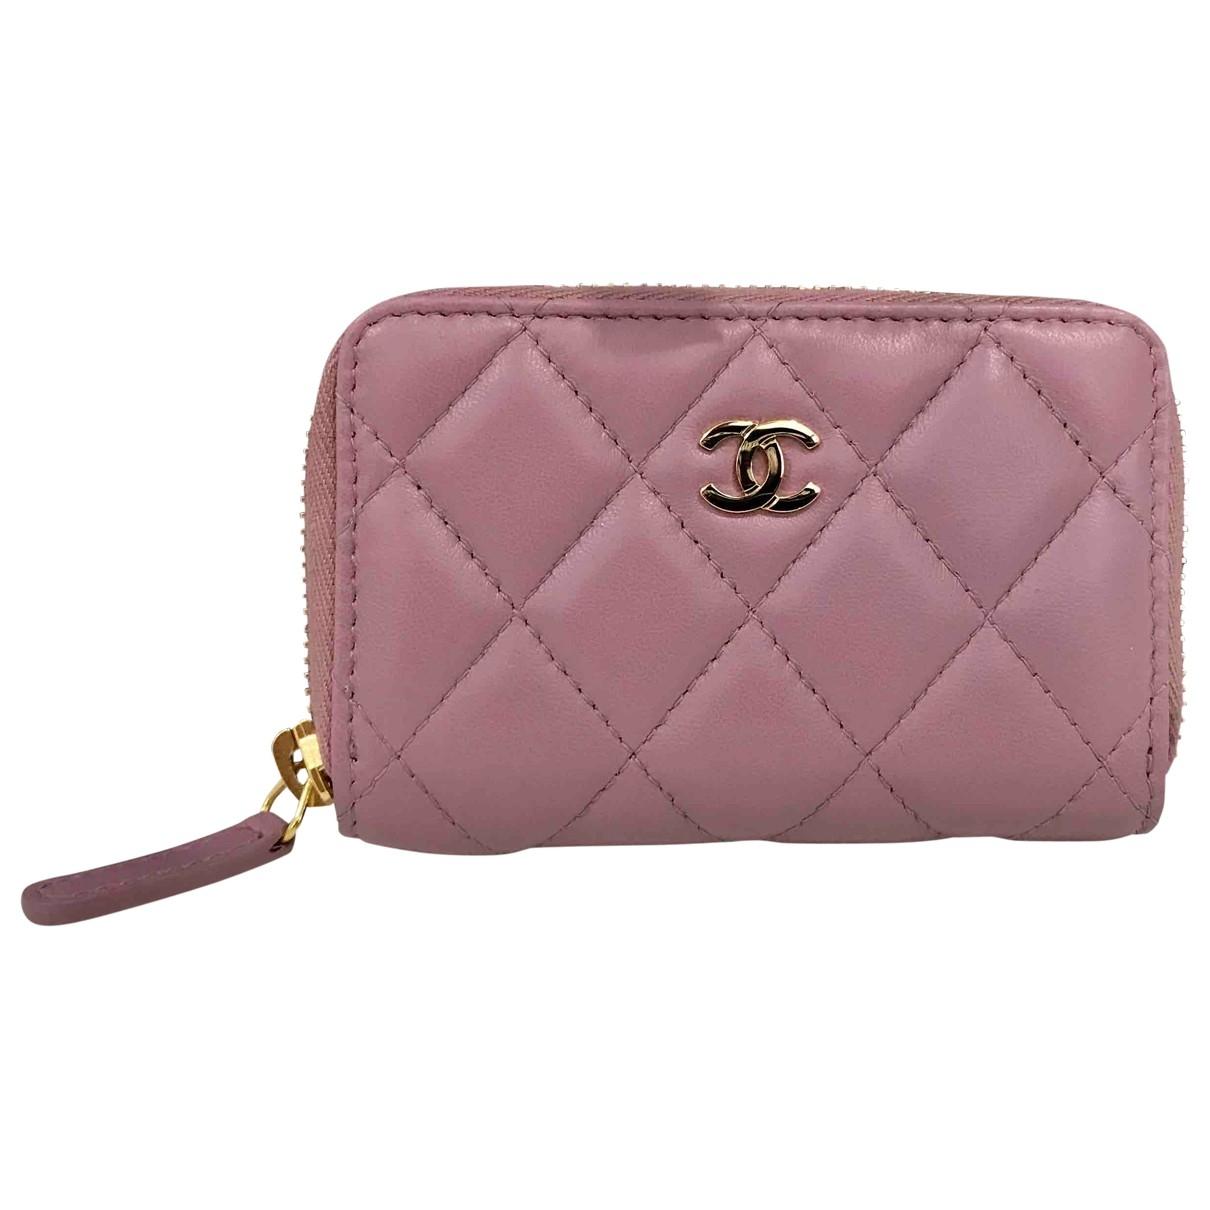 Chanel \N Portemonnaie in  Lila Leder